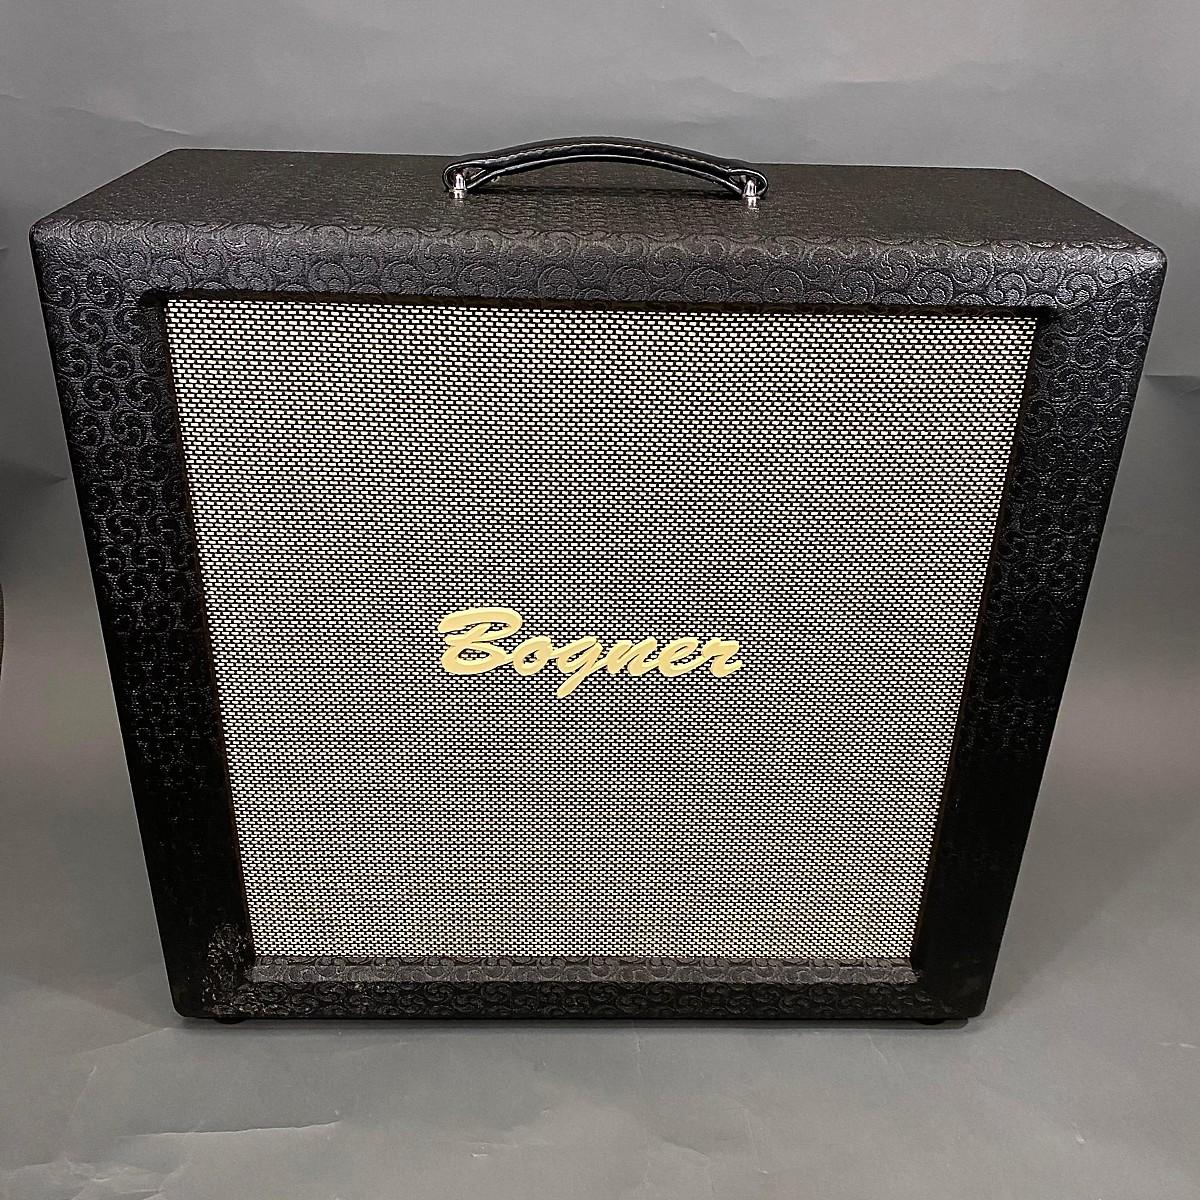 Bogner 212GFO Goldfinger 2x12 Guitar Cabinet